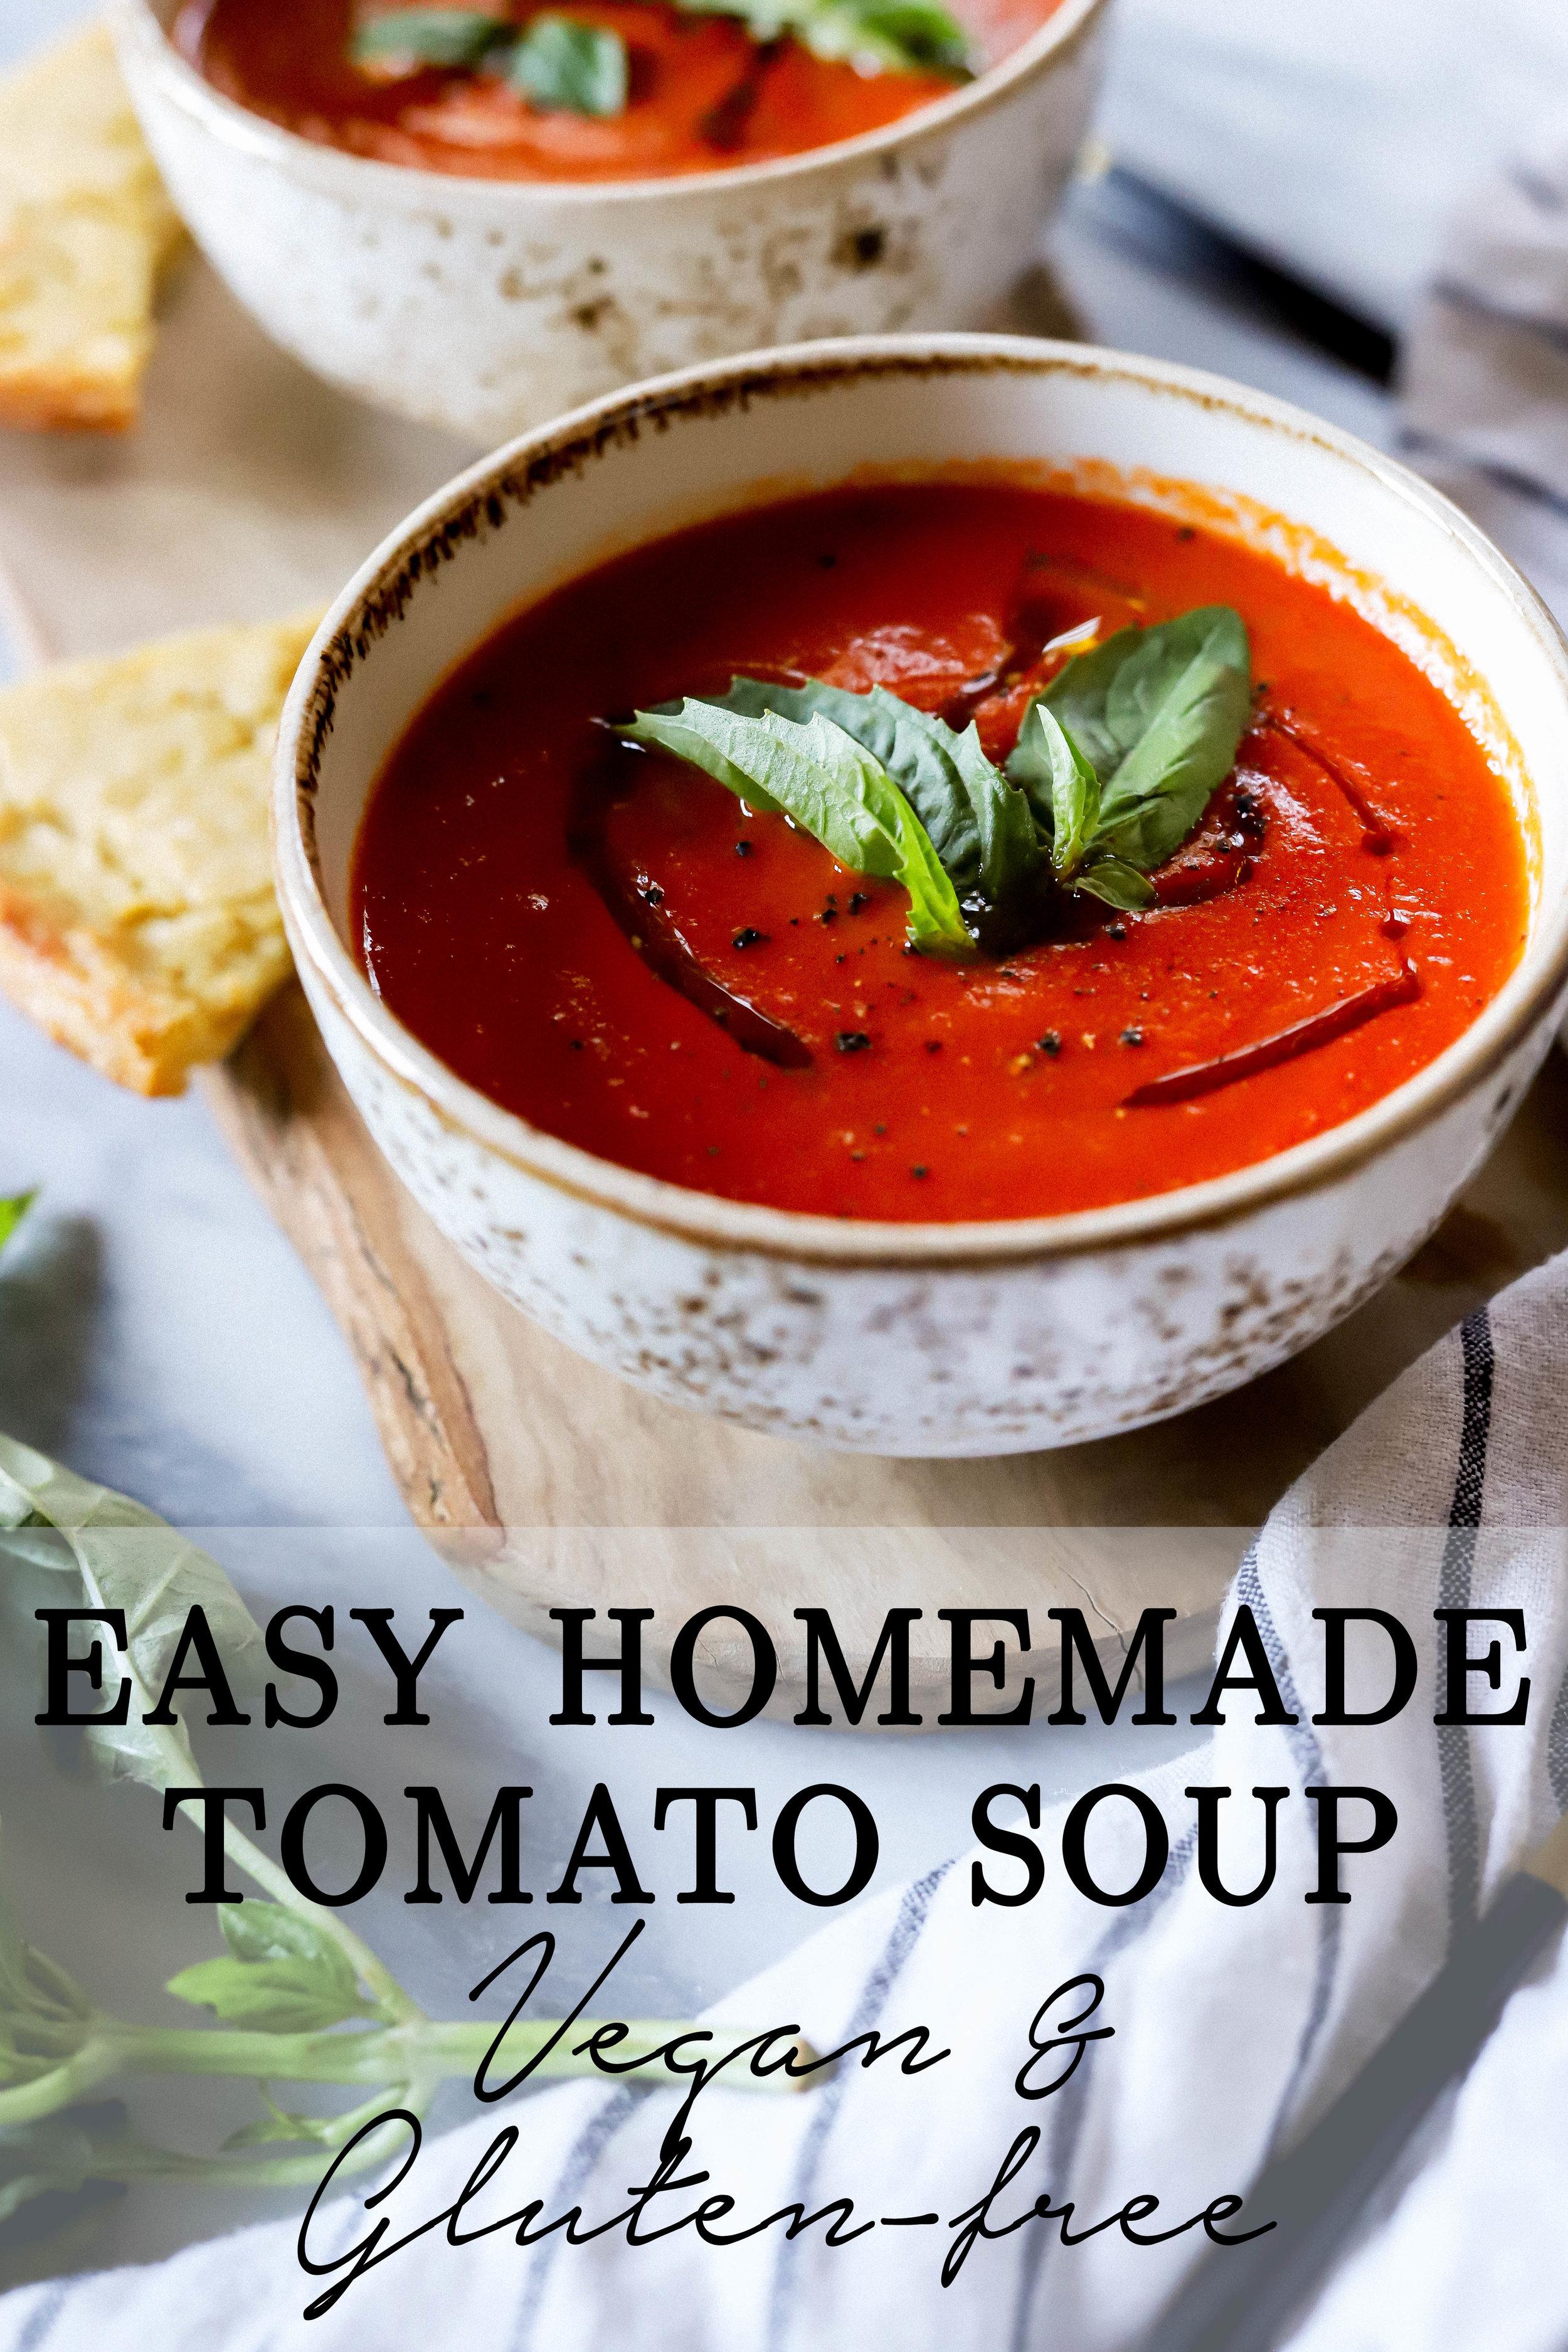 Easy vegan and gluten-free homemade tomato soup